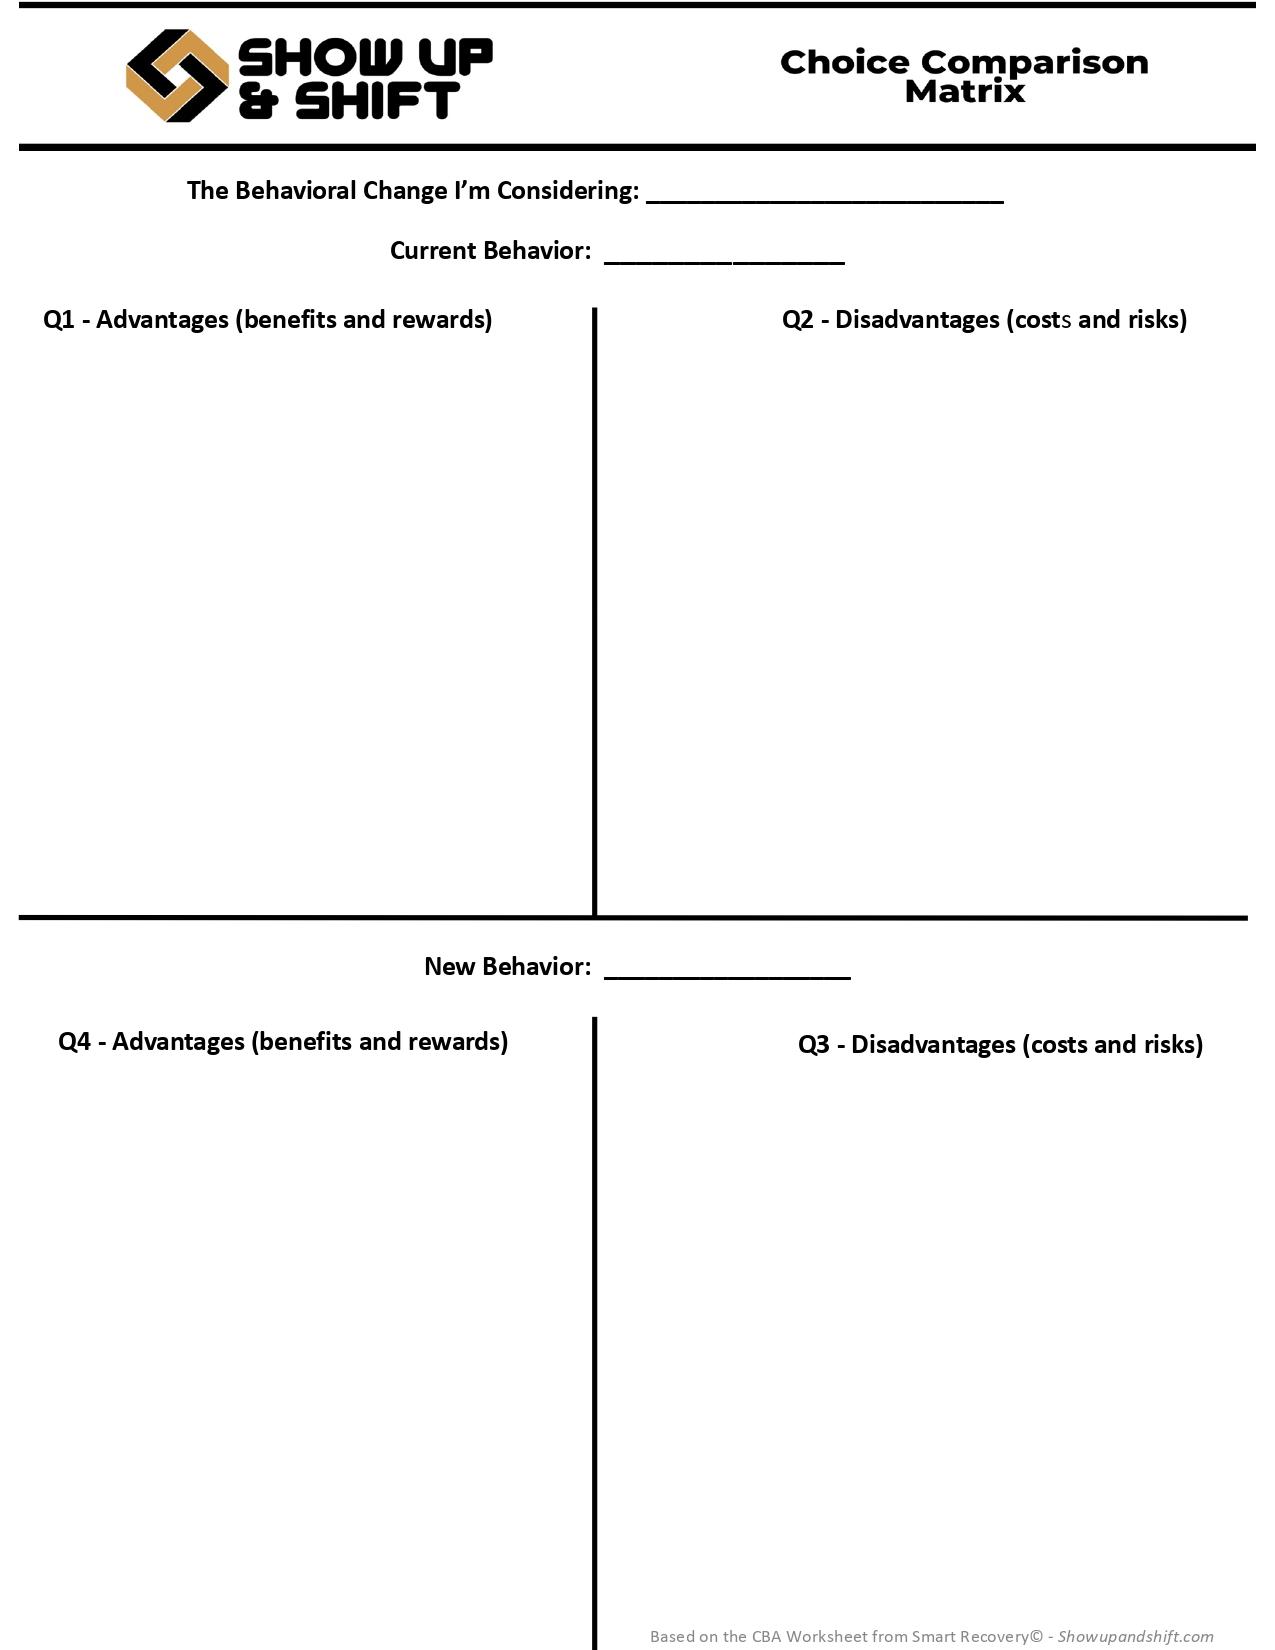 Choice Comparison Matrix Example